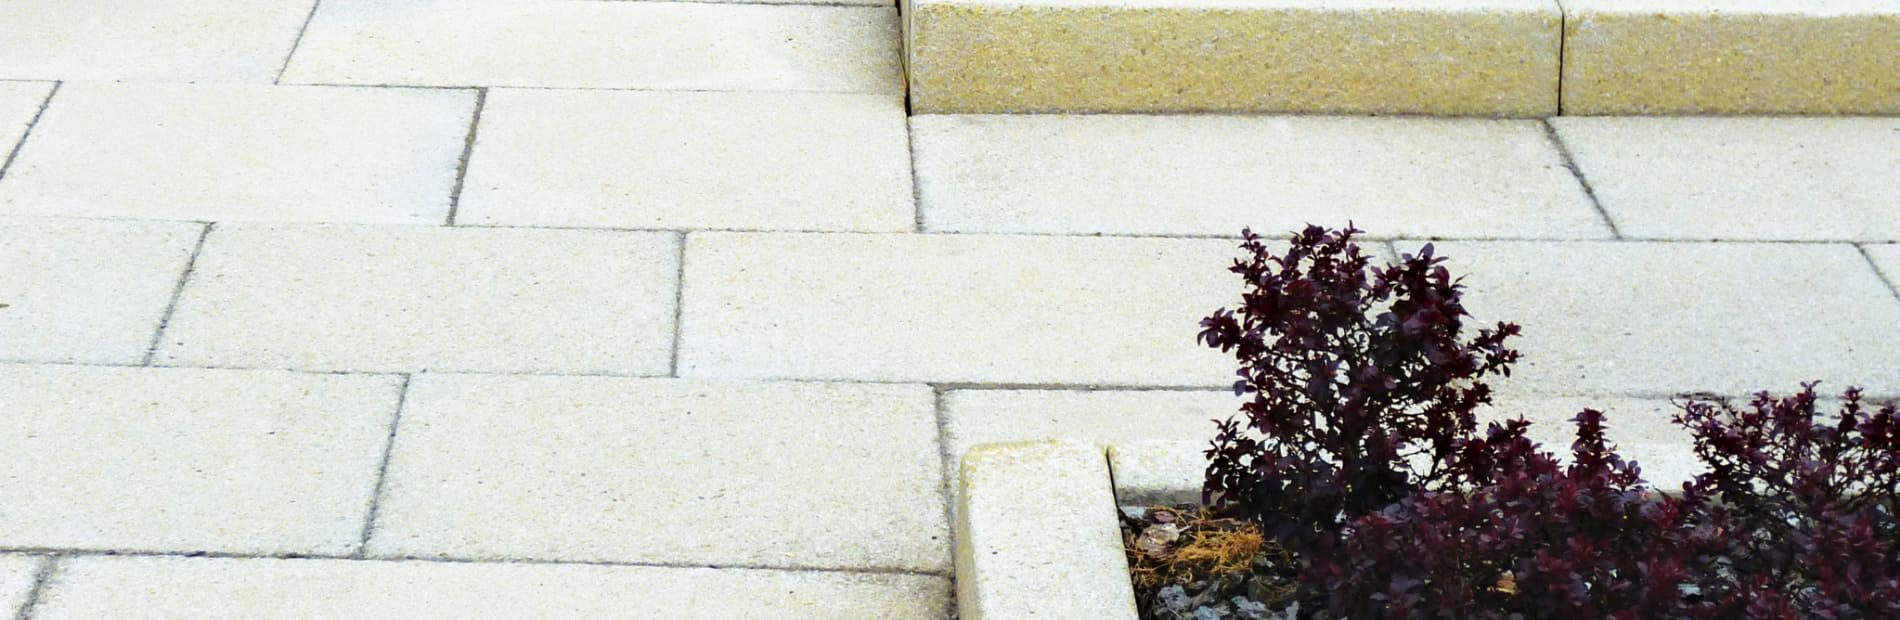 saxon buff paving laid insitu gardens setting